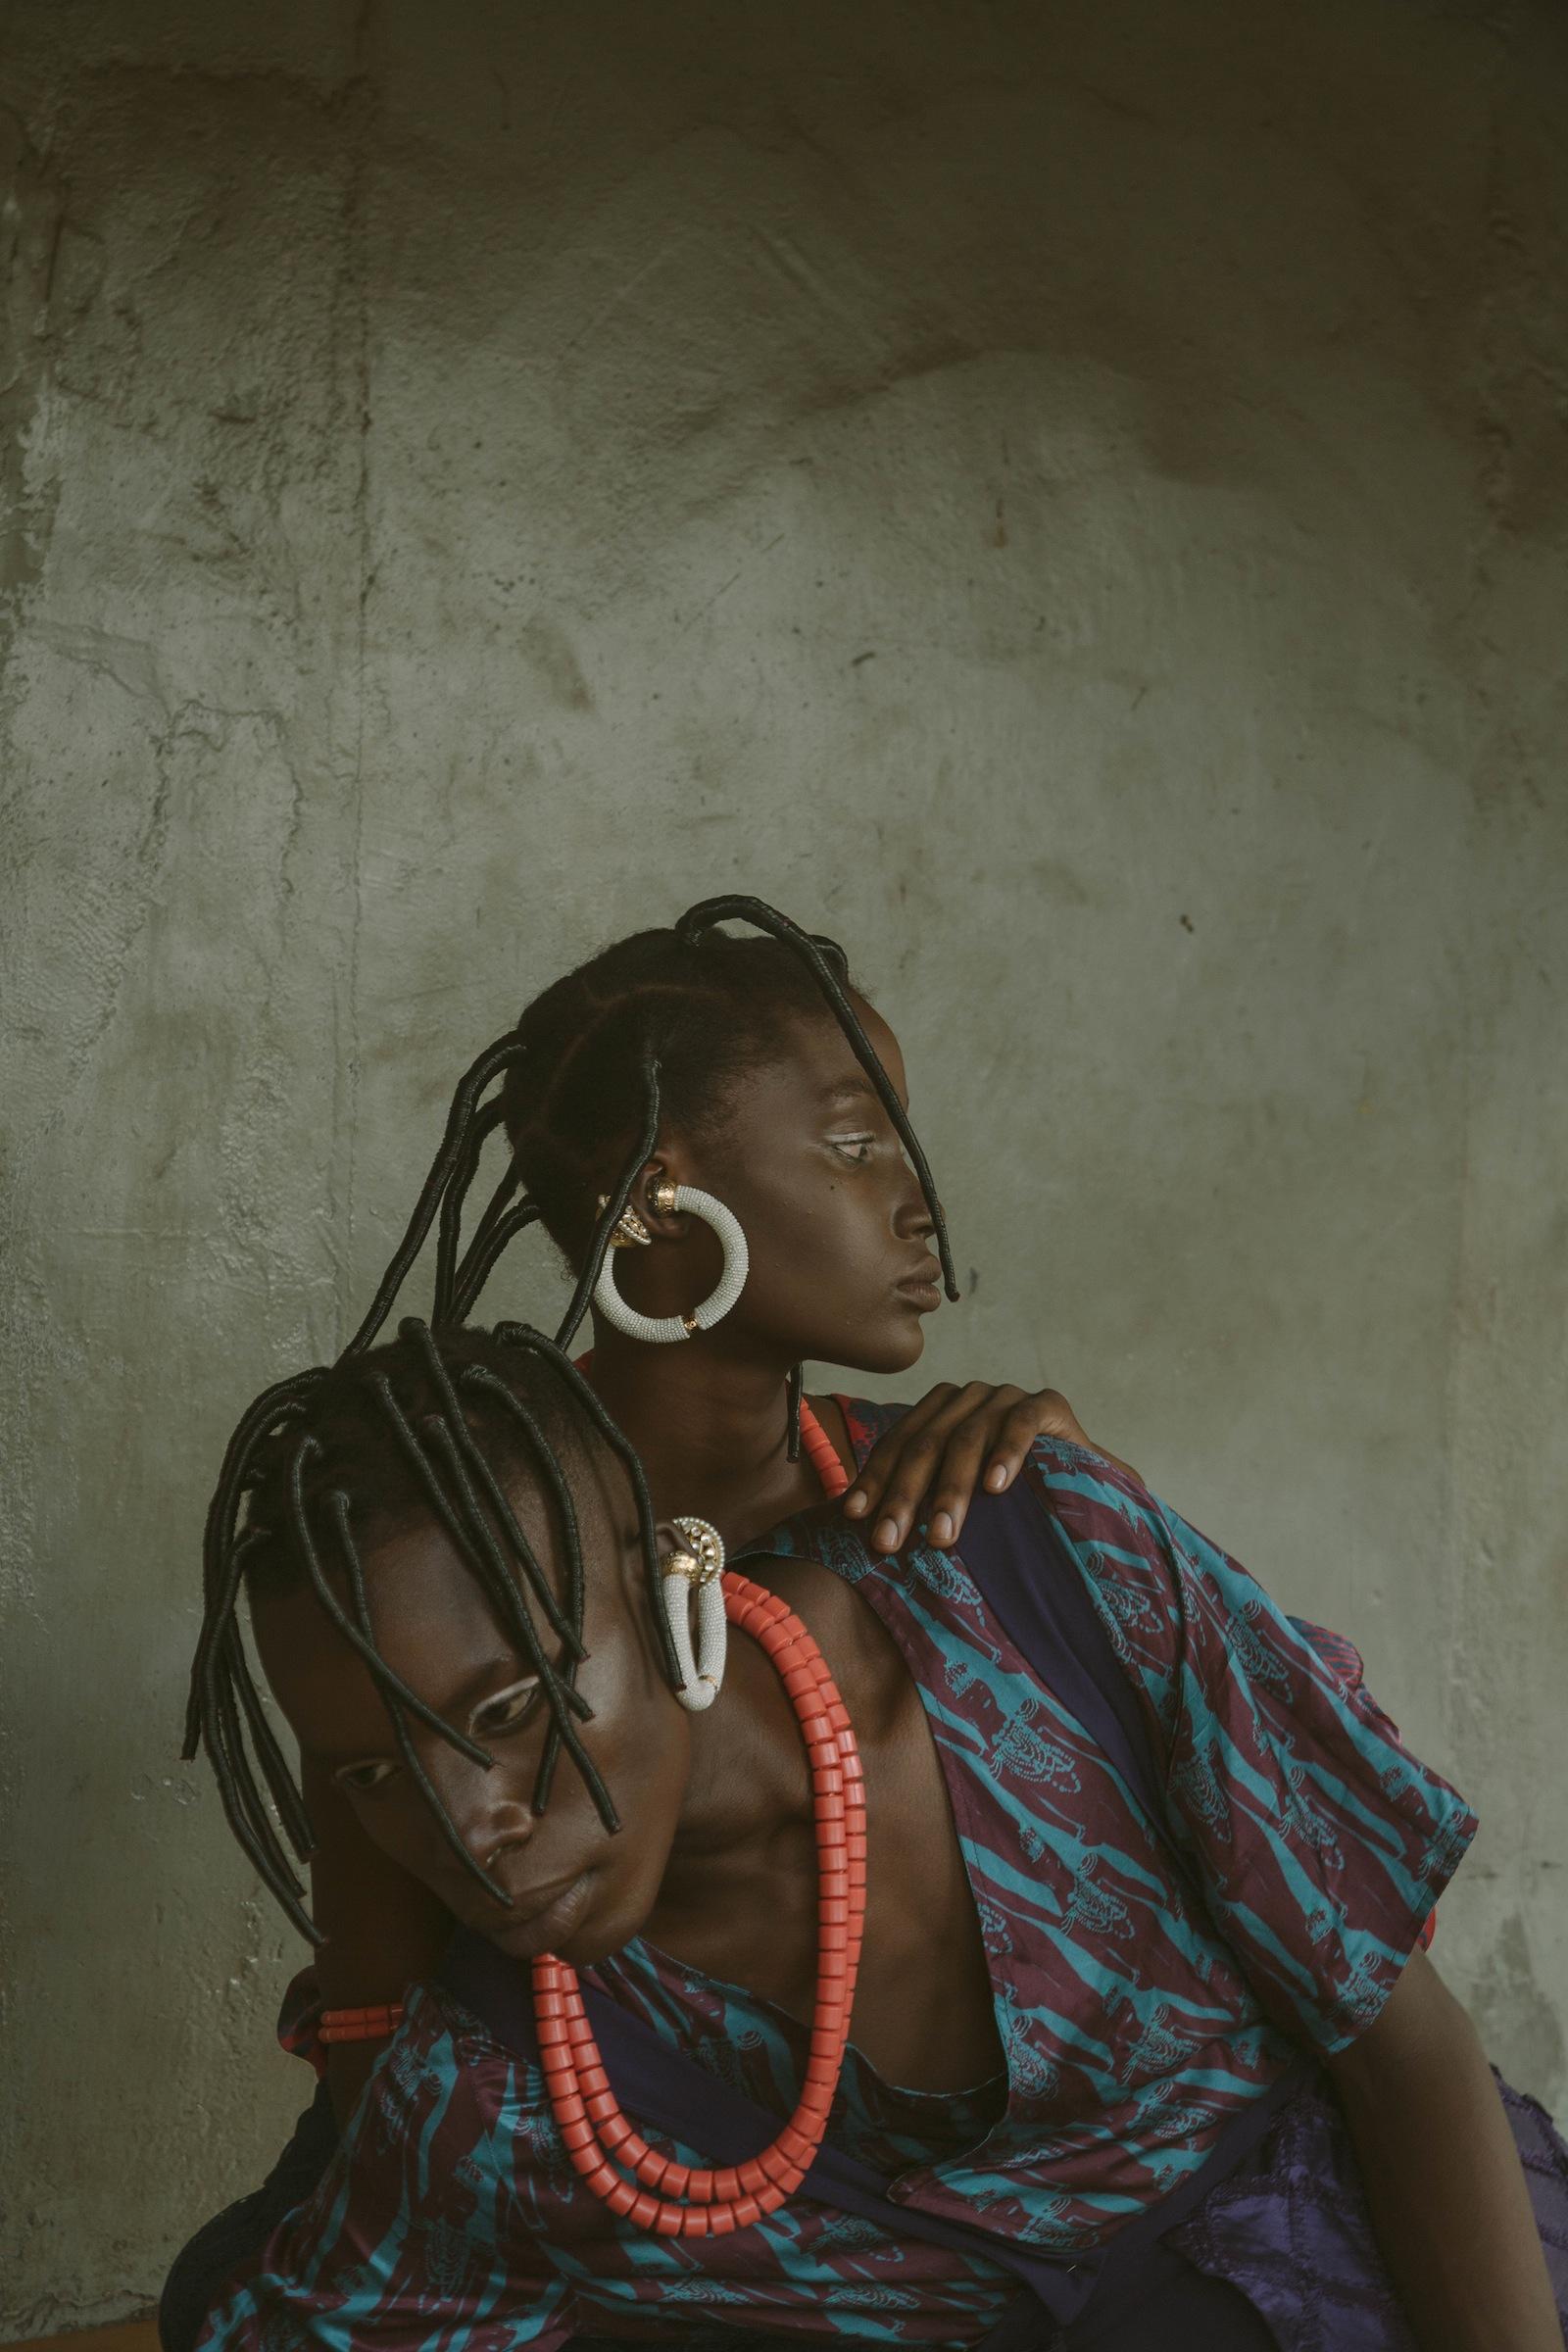 image by Daniel Obasi